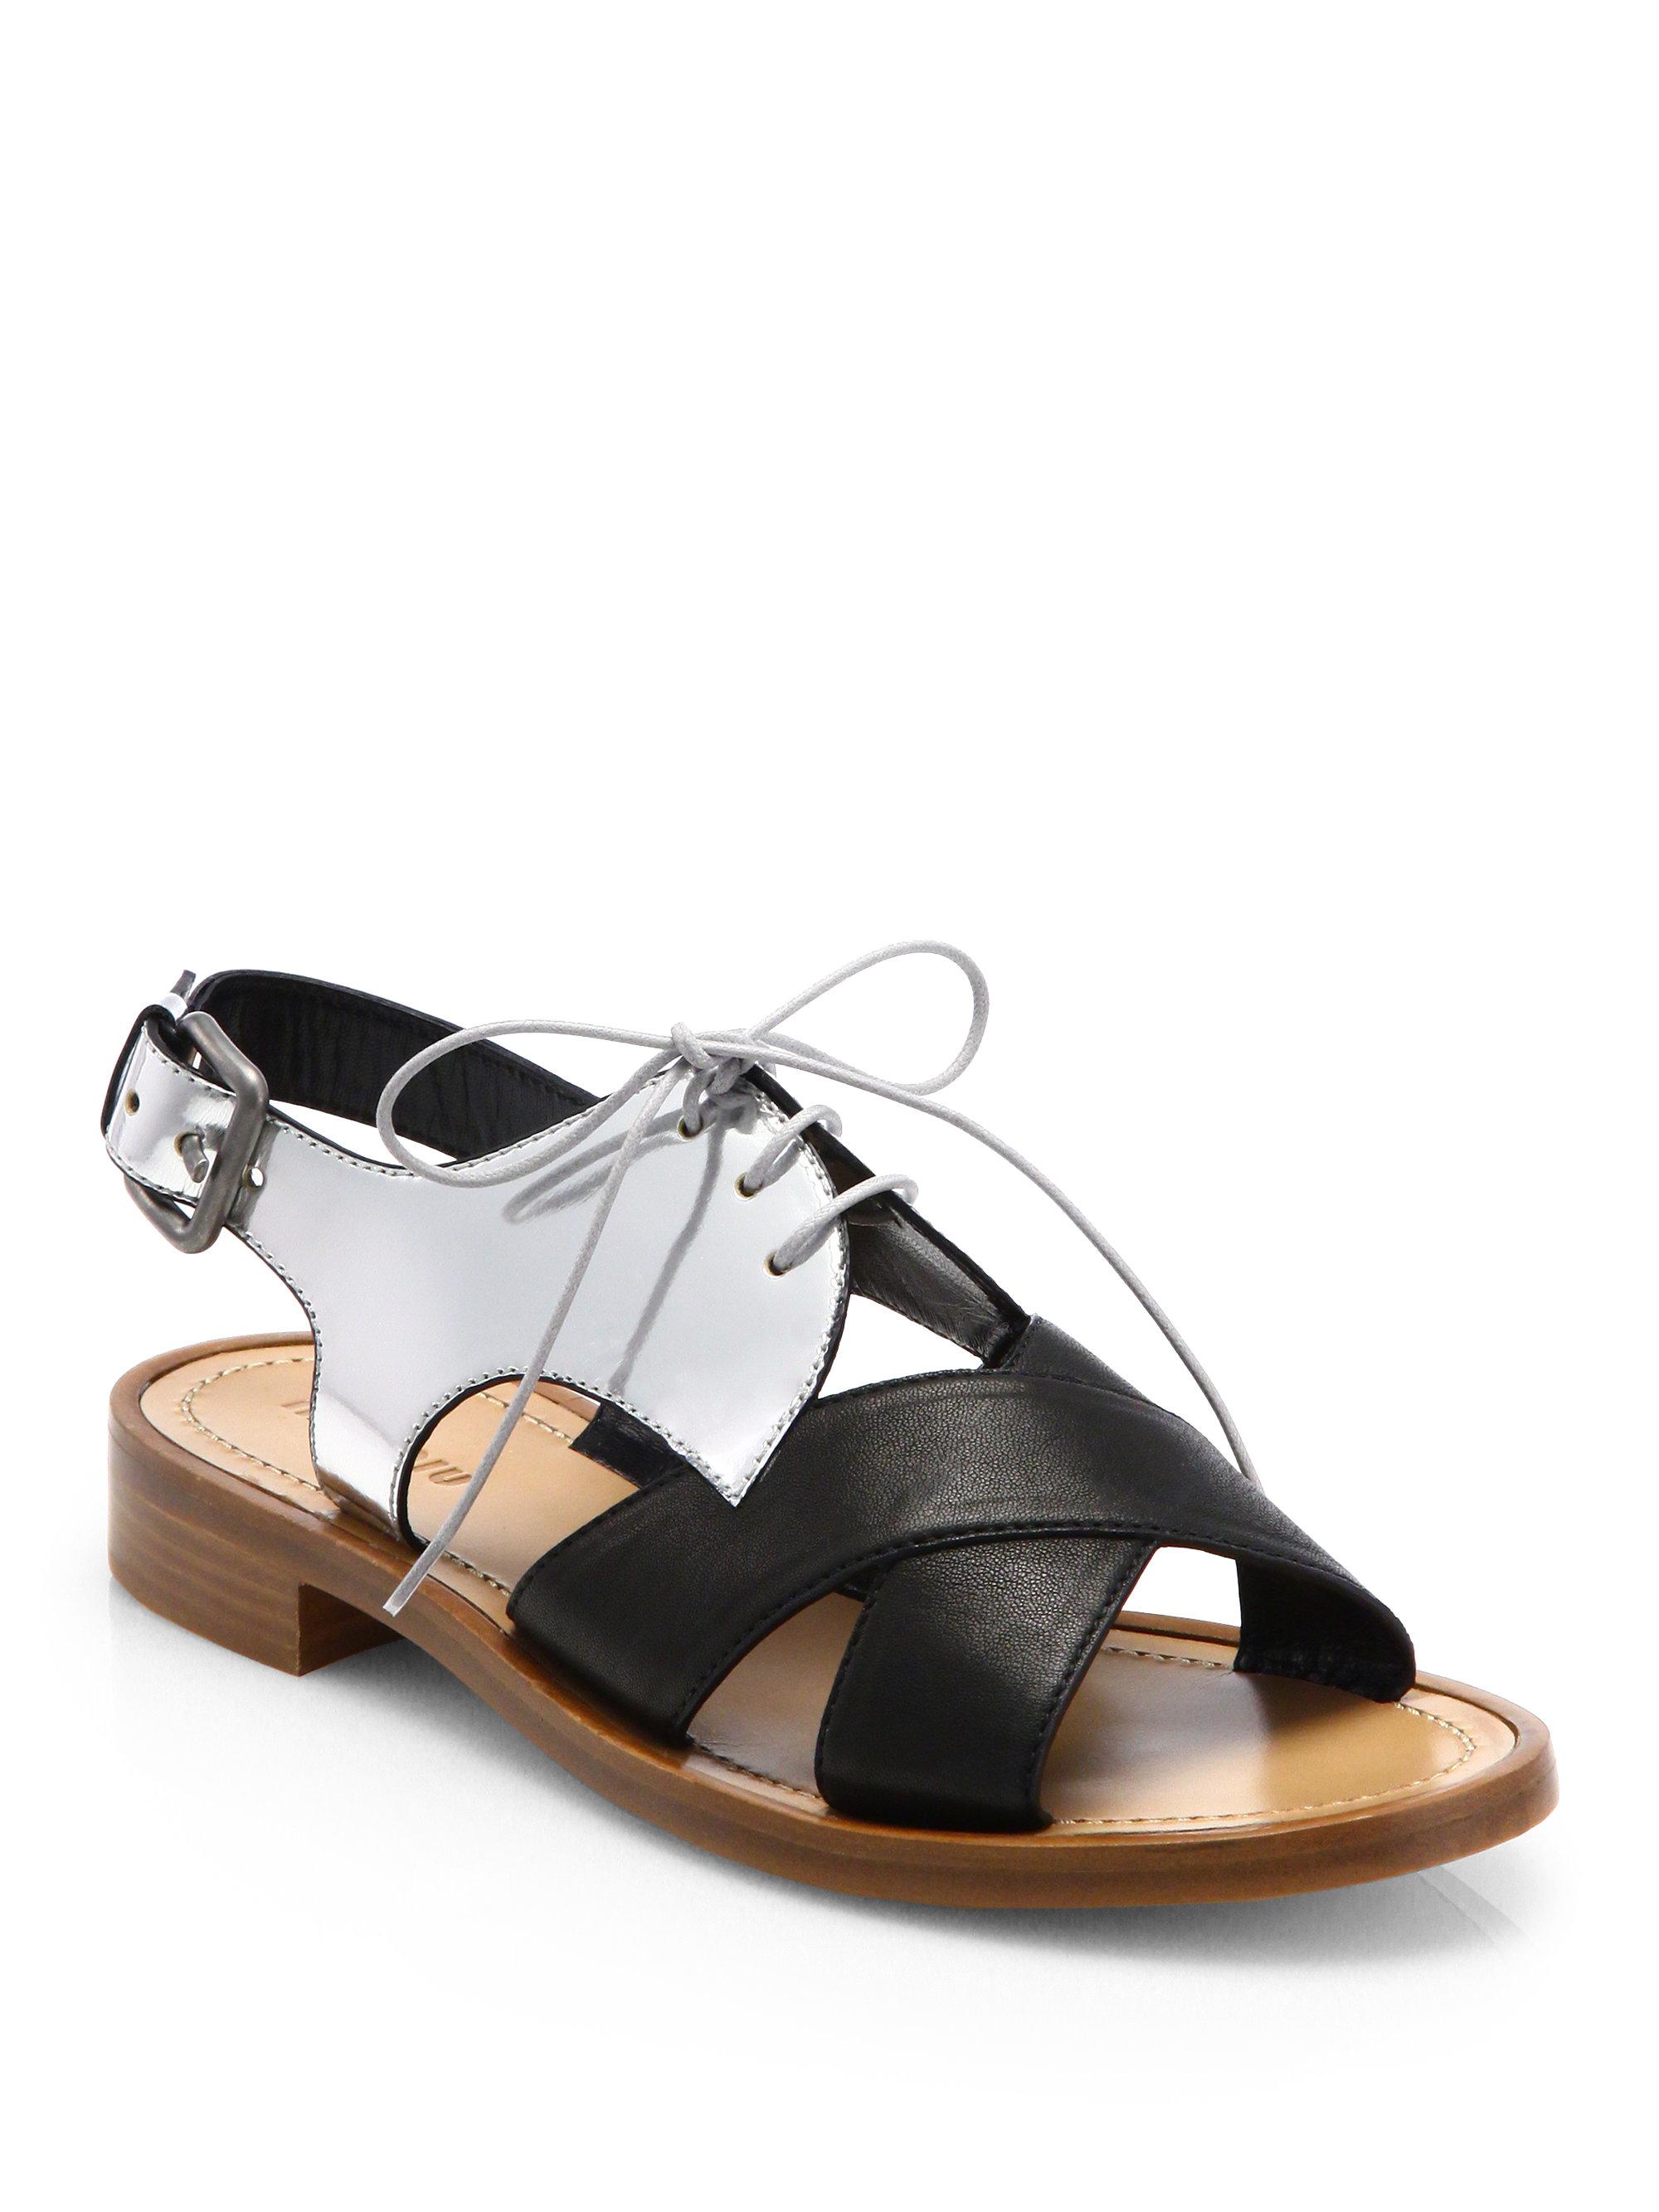 Miu Miu Bicolor Metallic Leather Cutout Sandals In Black